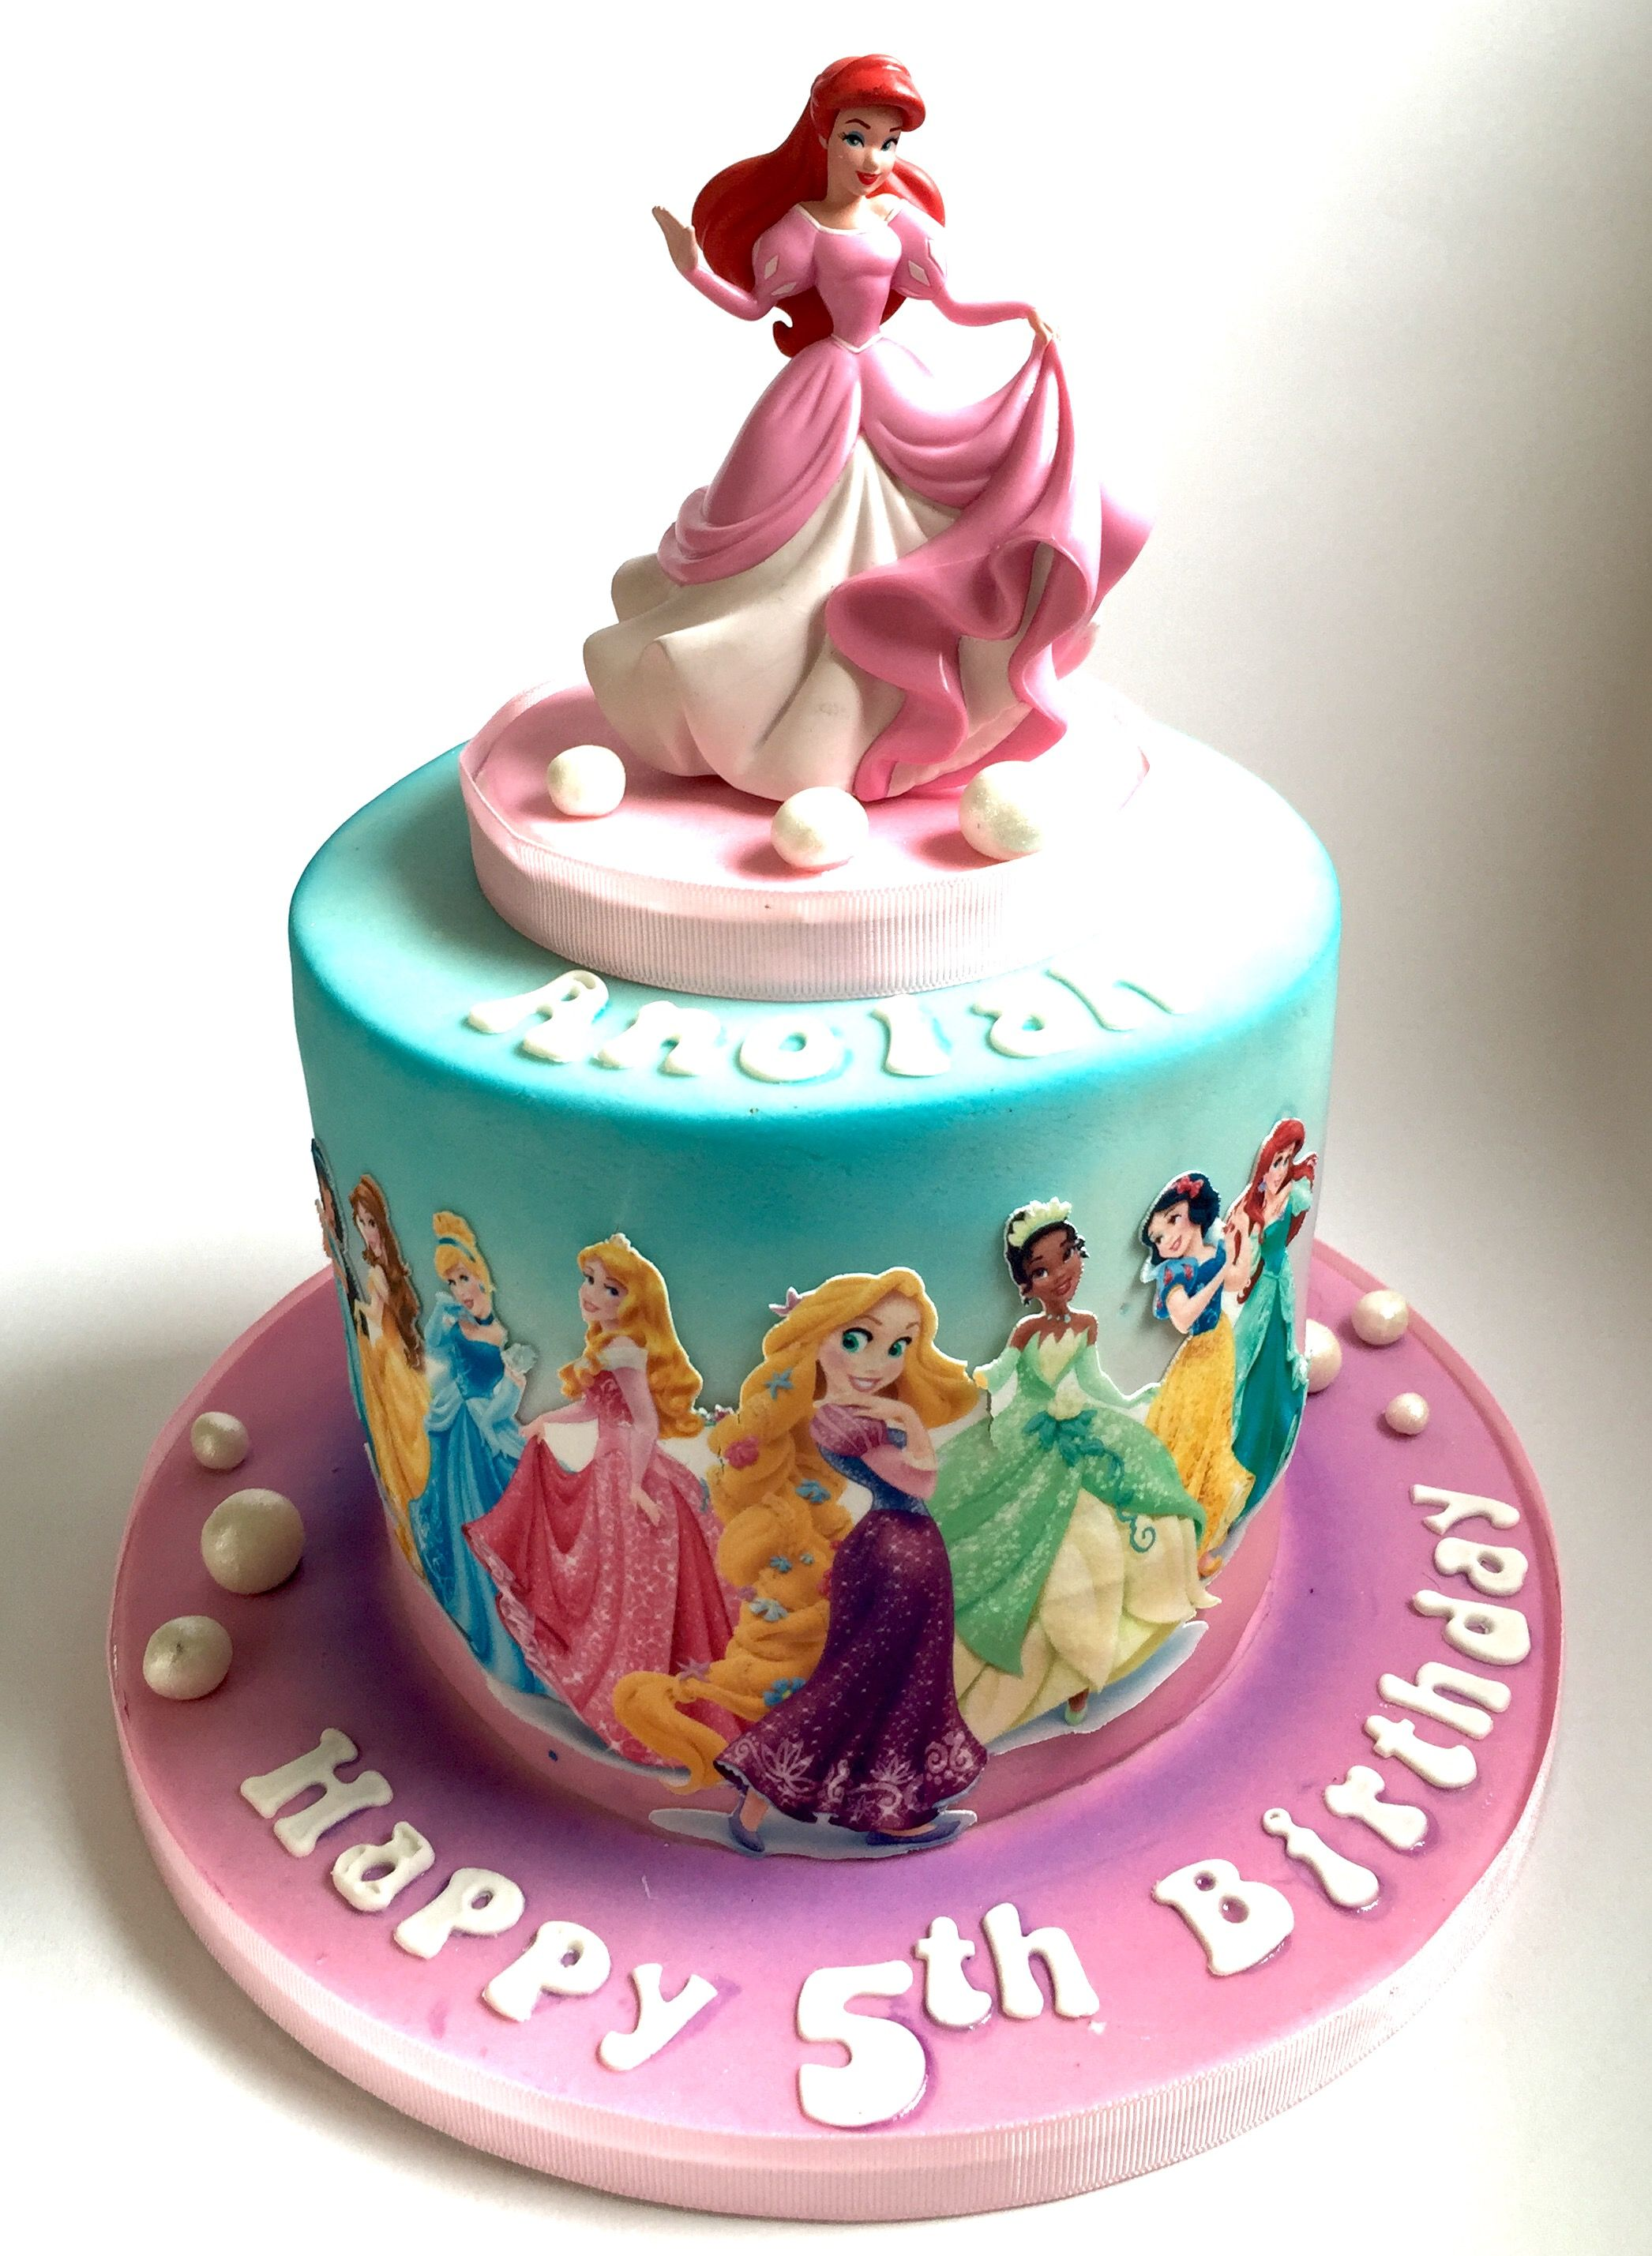 Best Disney Princess Cakes